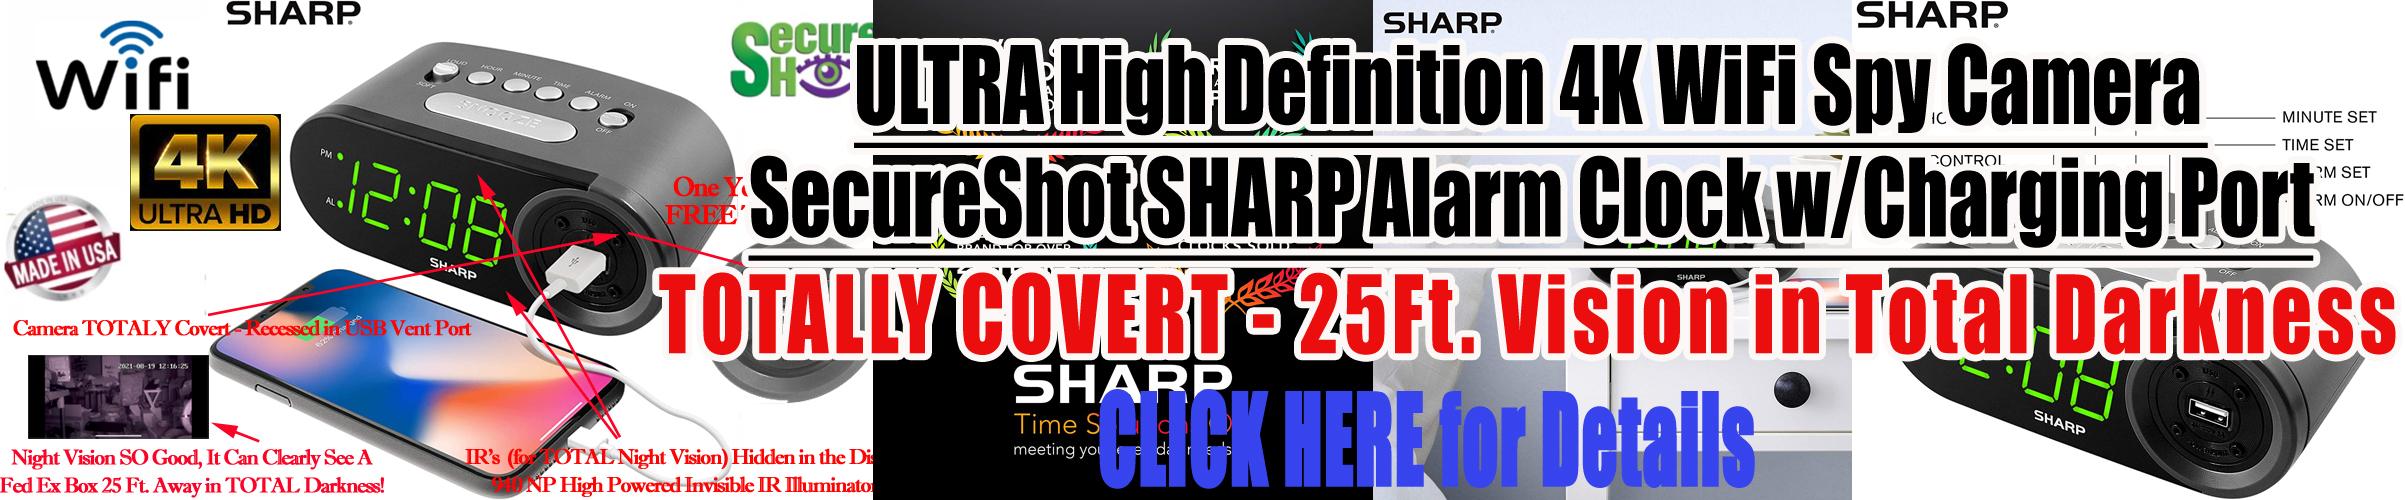 SecureShot Sharp Nightvision Alarm Clock Wifi Spy Cemera/DVR